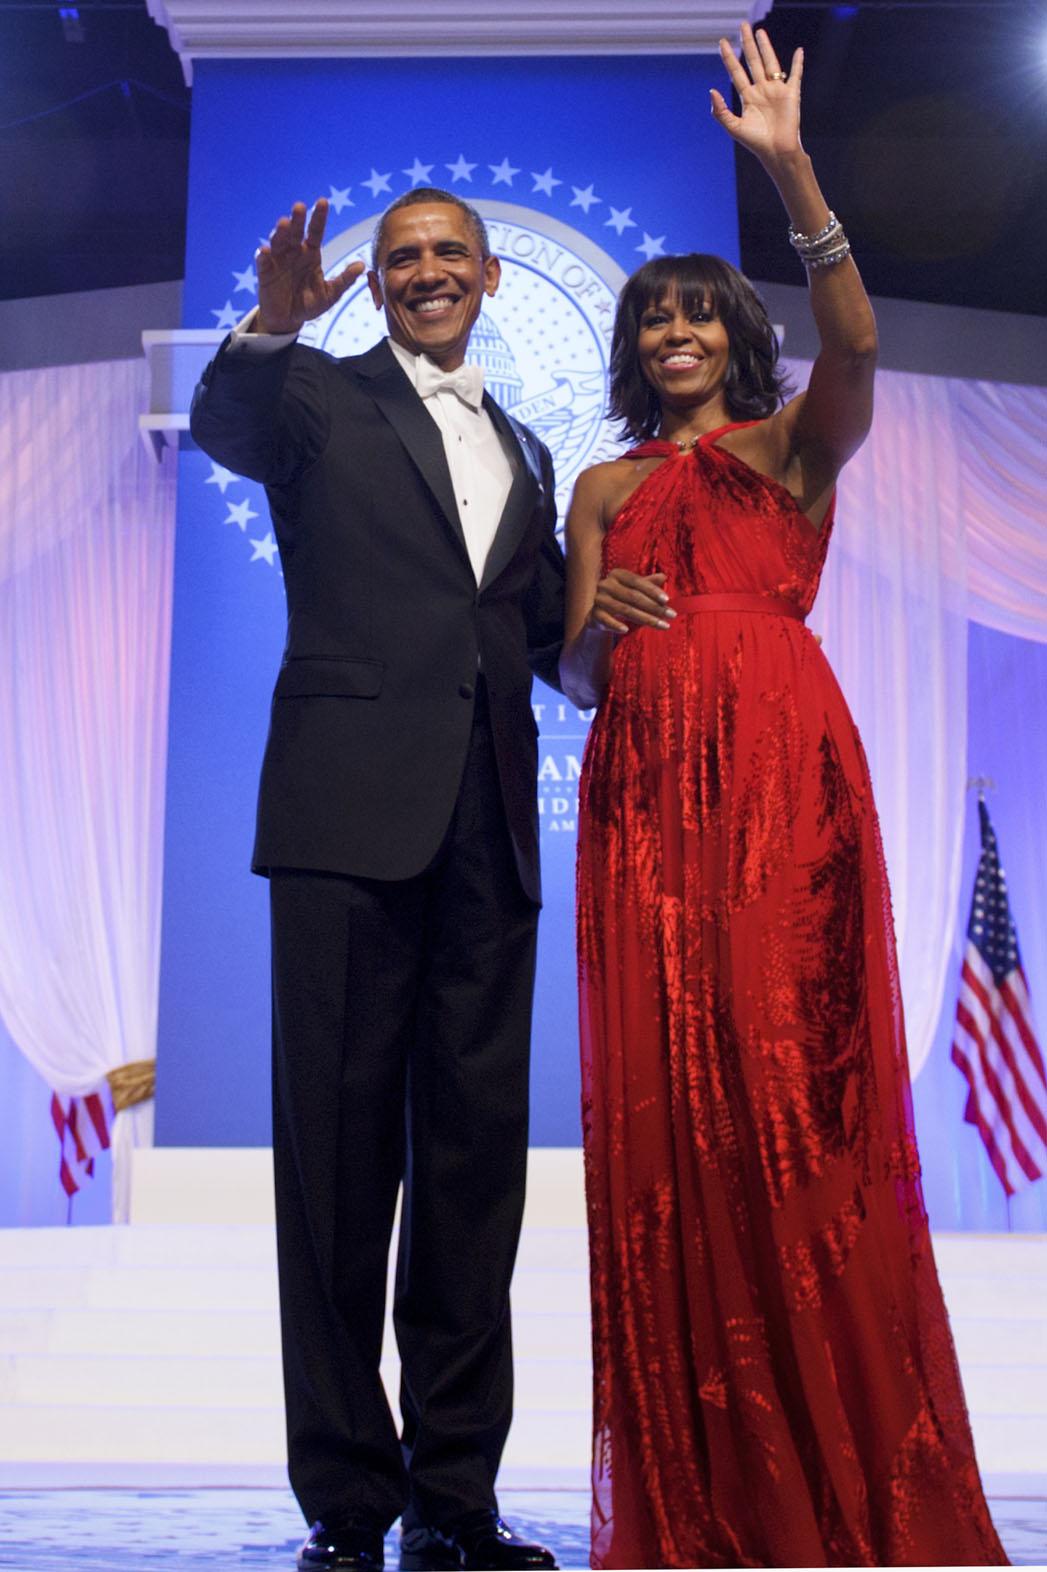 Michelle Obama Inauguration Dress - P 2014